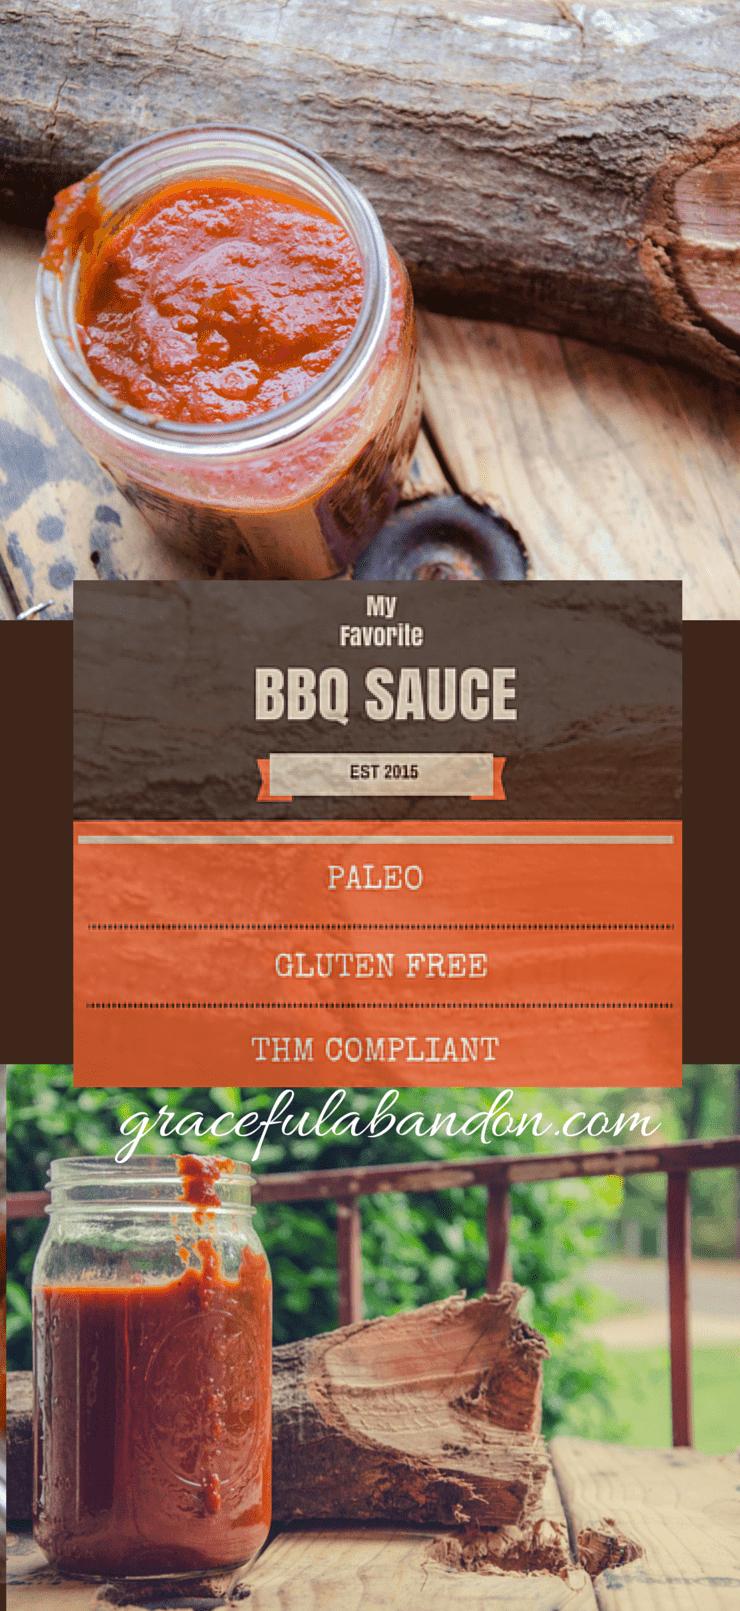 www.gracefulabandon.com My Favorite BBQ Sauce- Paleo, Gluten Free, THM Compliant